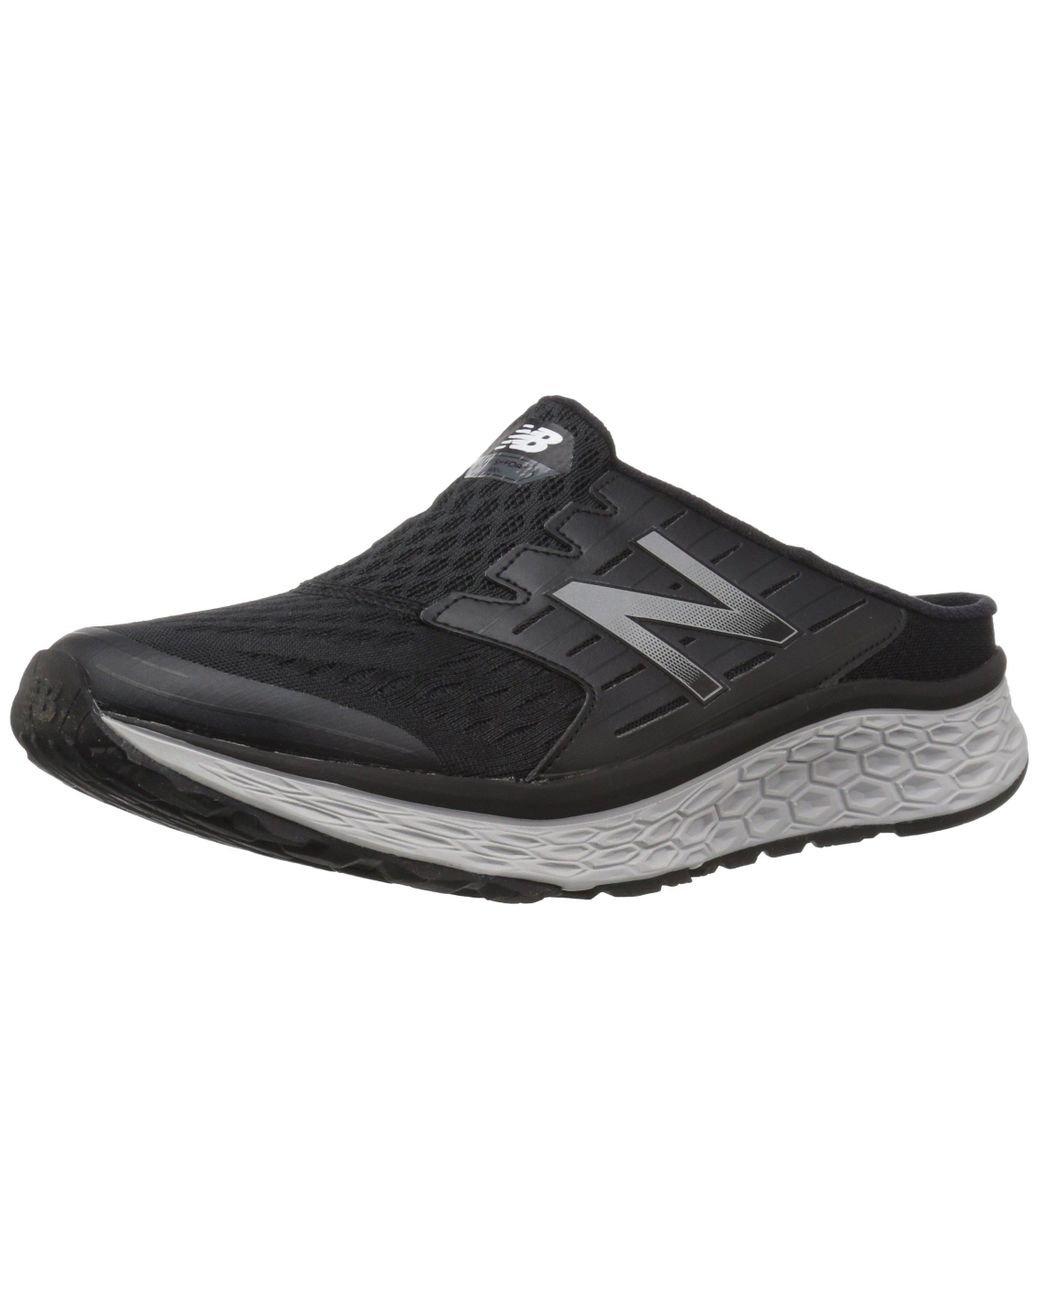 New Balance Synthetic Ma900v1 Walking